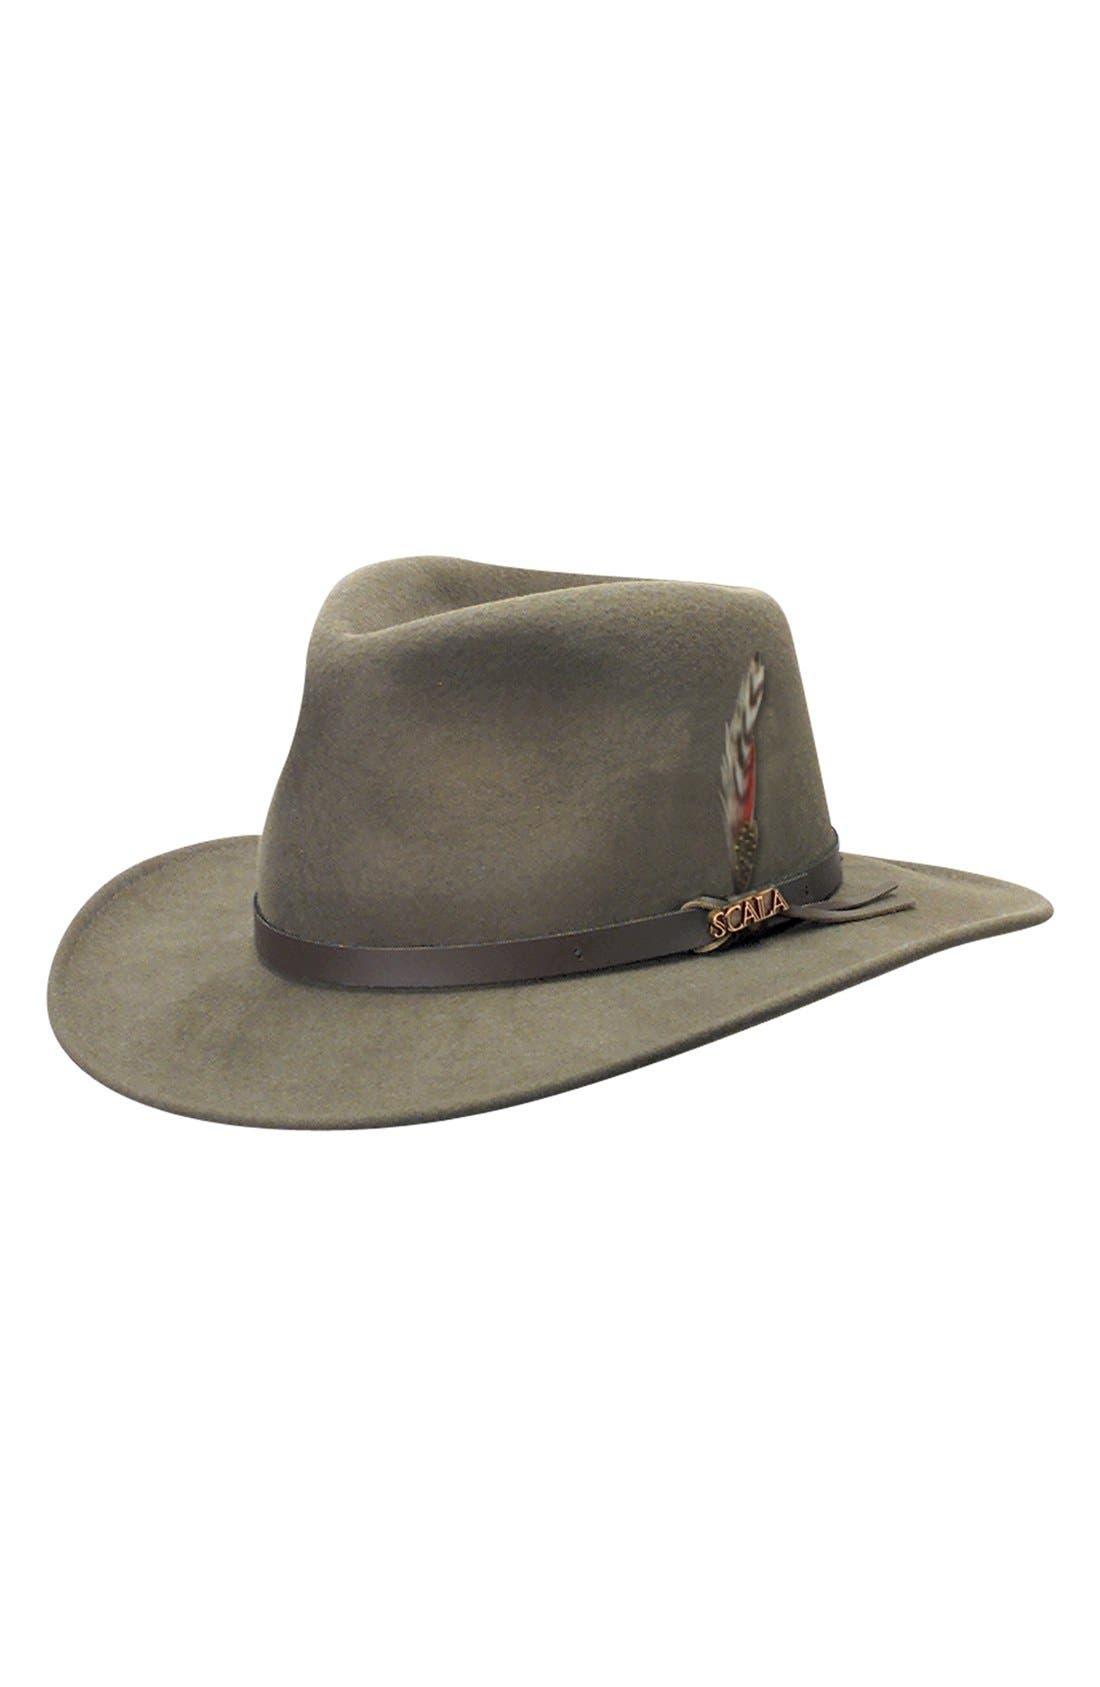 'Classico' Crushable Felt Outback Hat,                             Main thumbnail 1, color,                             KHAKI